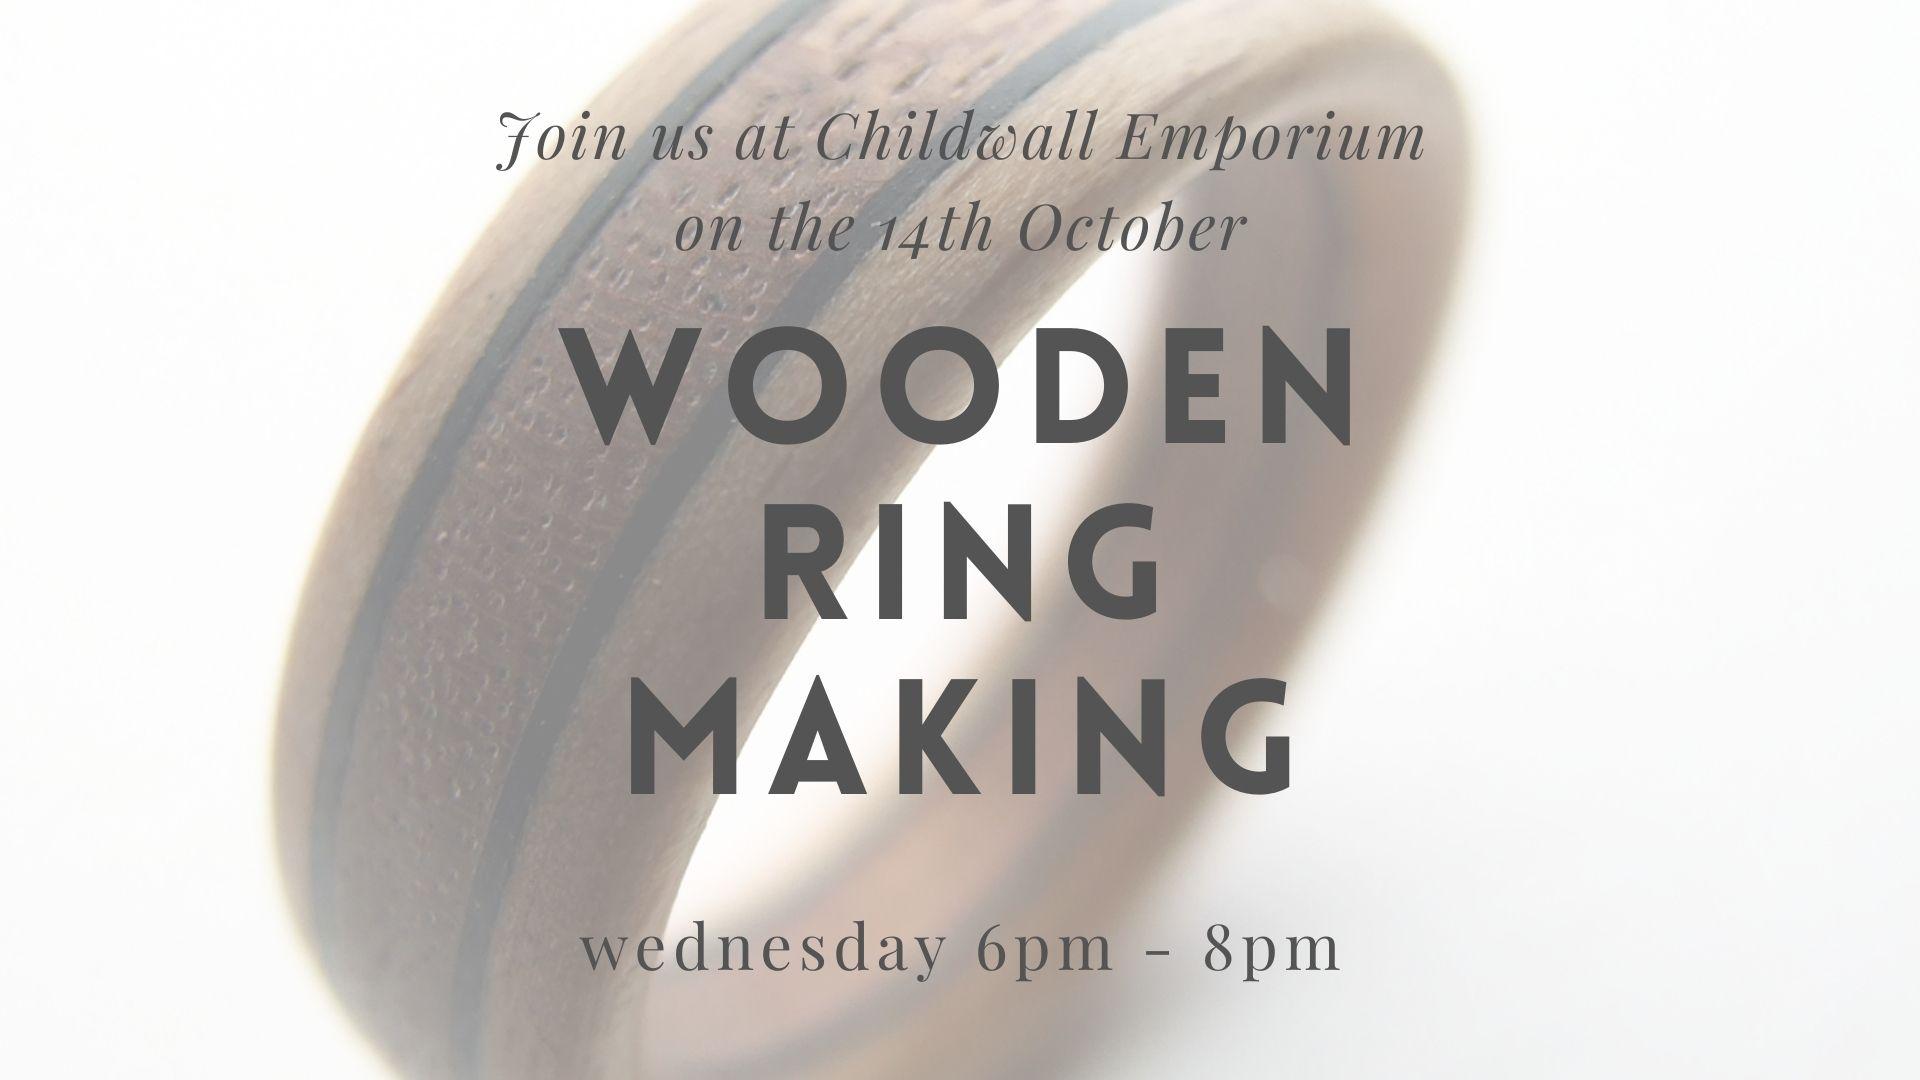 Childwall Emporium: Wooden Ring Making